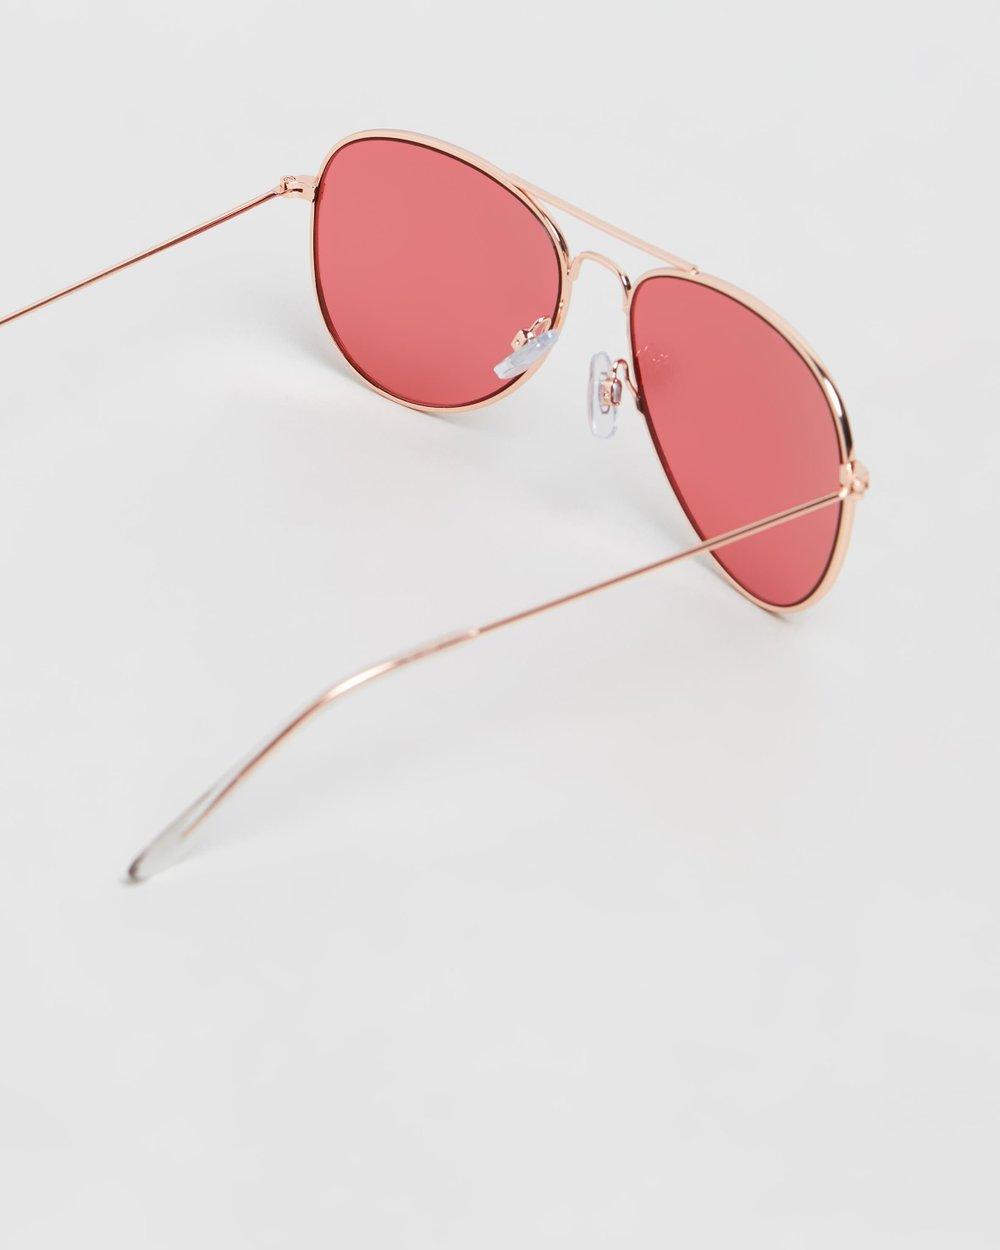 5a55d5d89e Arabella Metal Sunglasses by Rubi Online